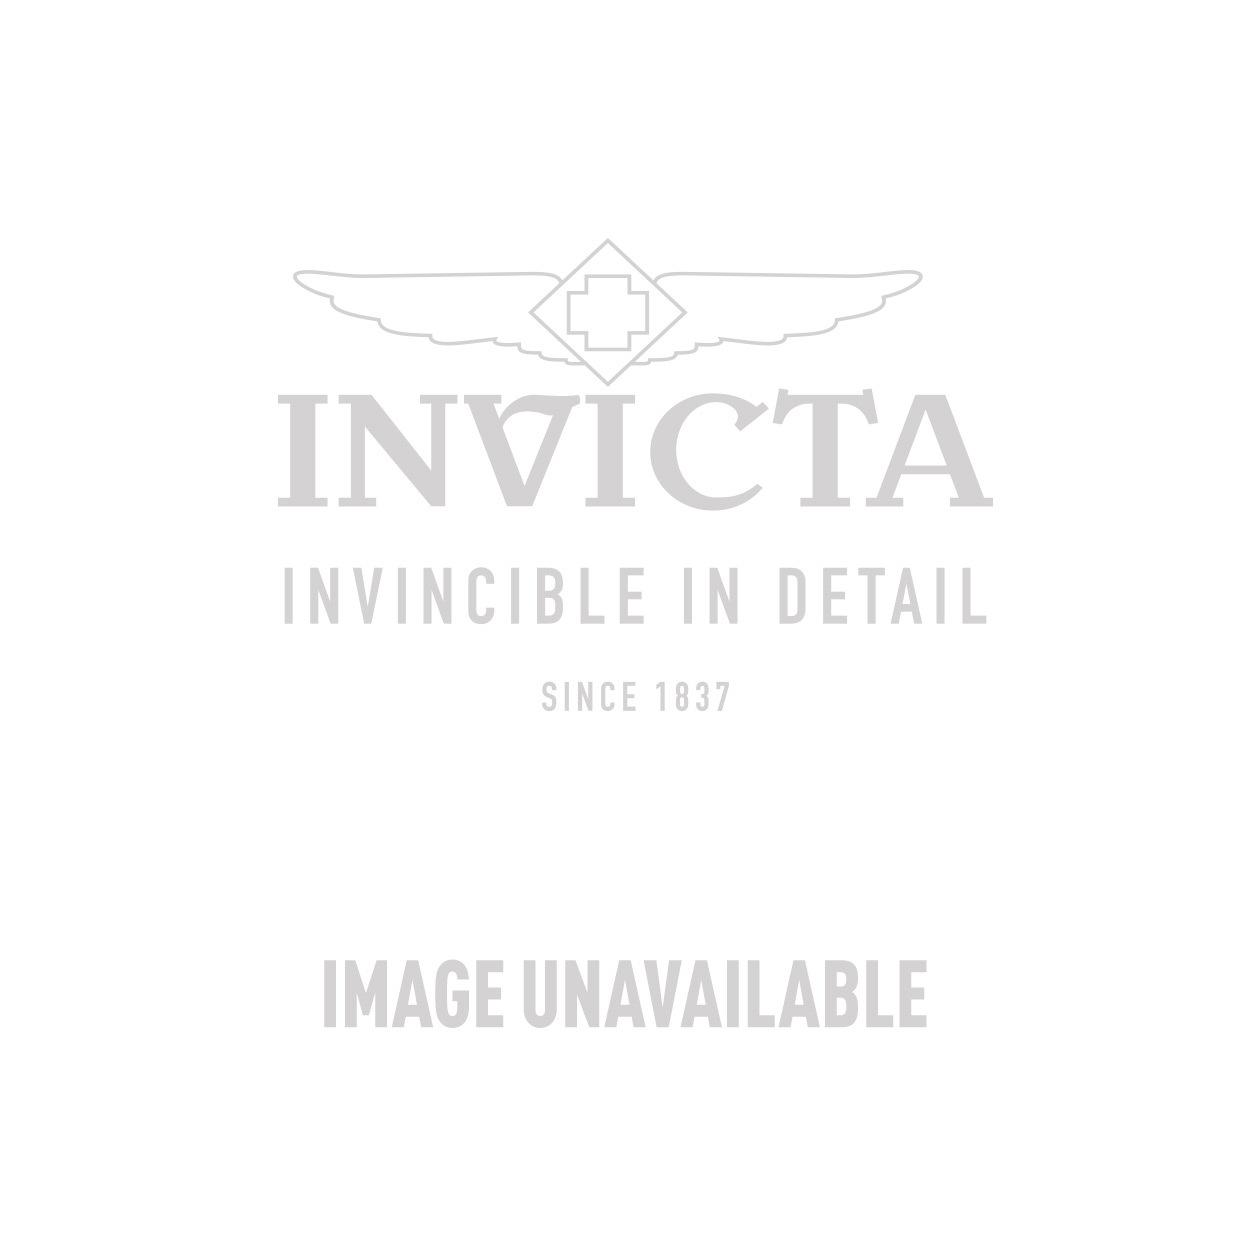 Invicta Sea Hunter  Quartz Watch - Stainless Steel case with Black tone Polyurethane band - Model 1544